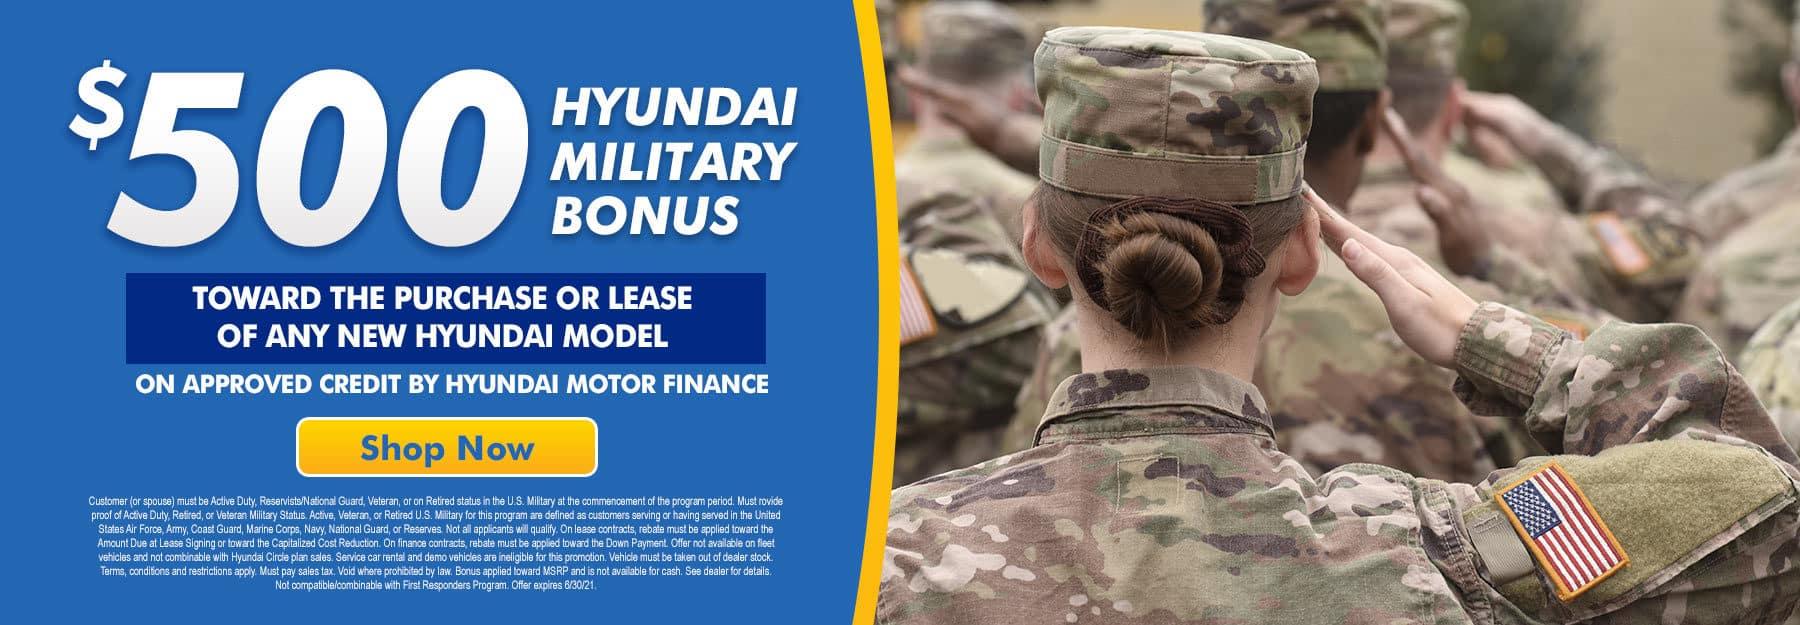 NRHyundai_Military_1800x625_5-21